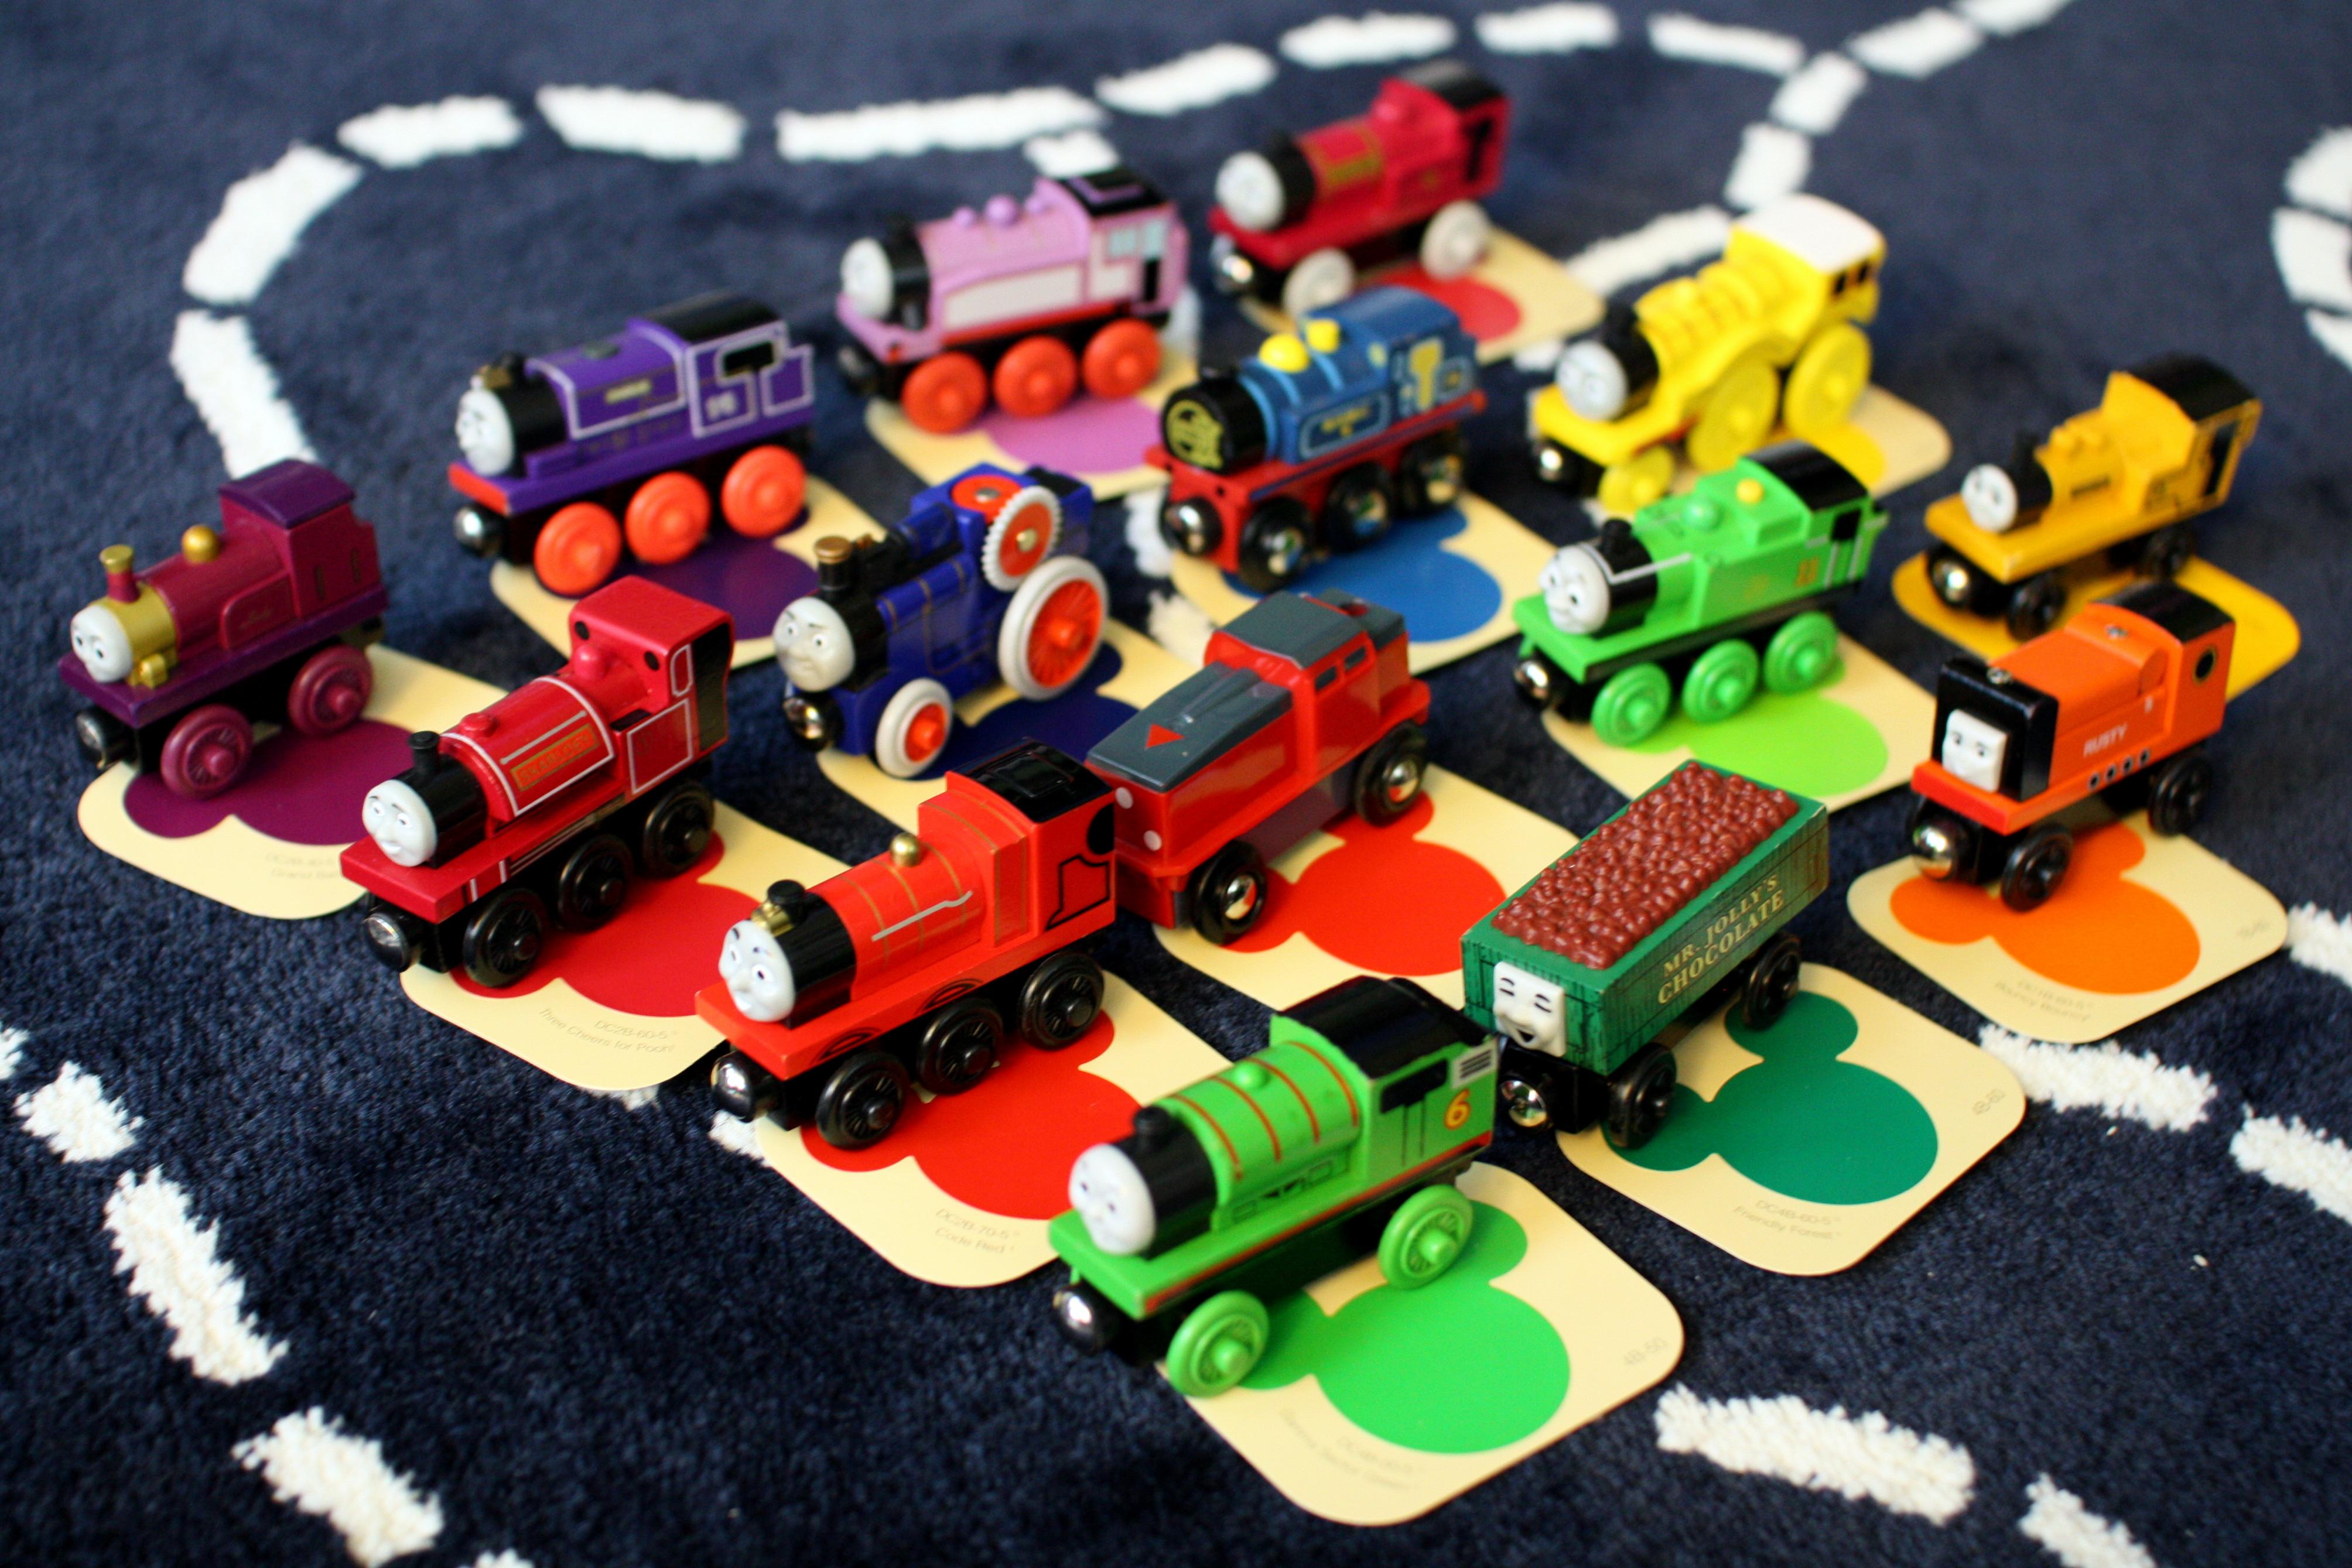 engine paint shop train color matching activity for preschoolers